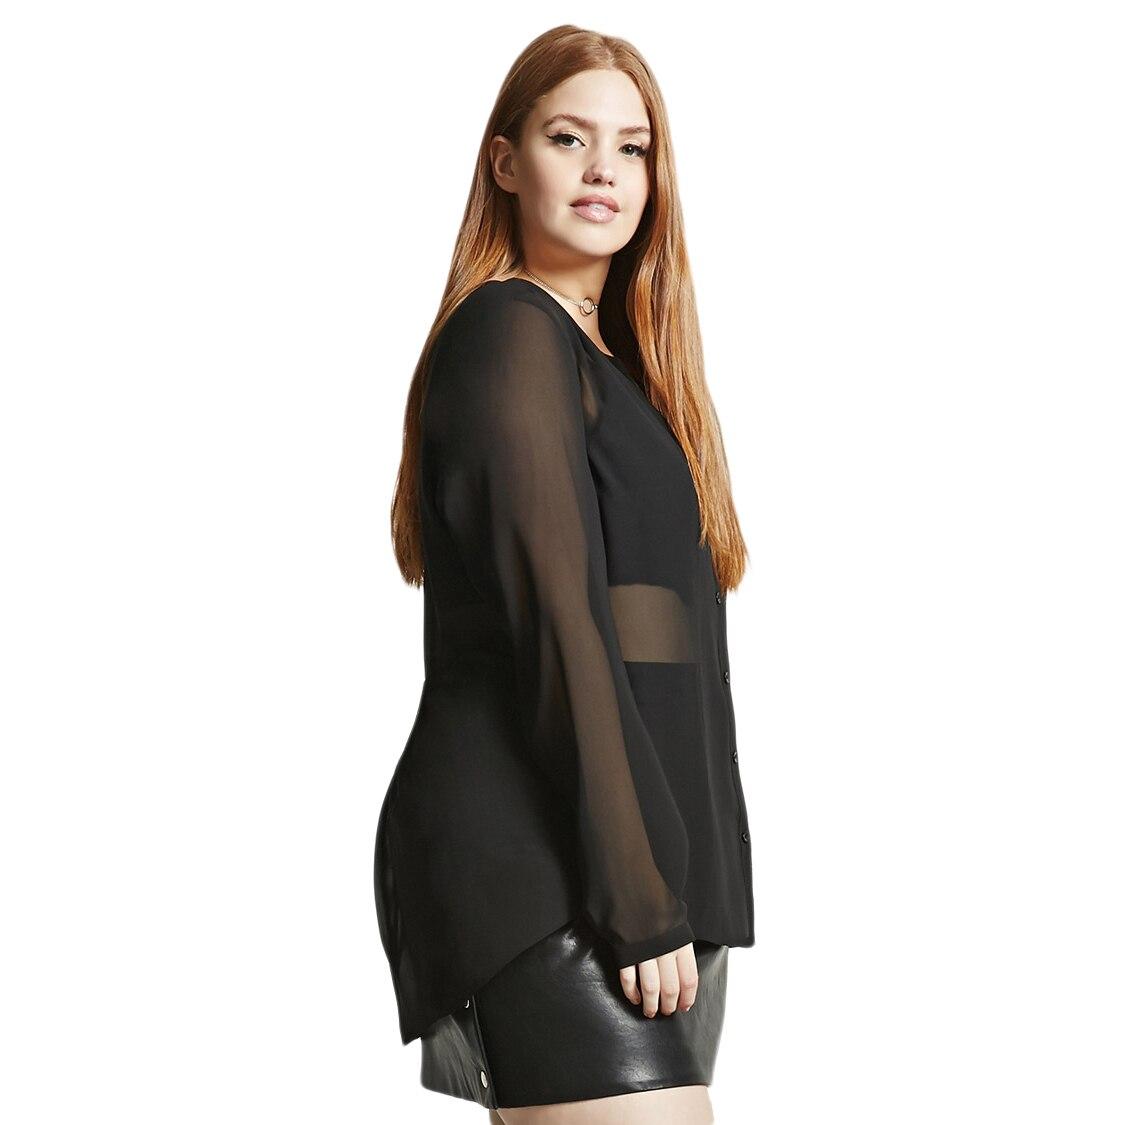 ec06c497b2520 Kissmilk Plus Size Semi Sheer V Neck Button Down Stretchy Women ...